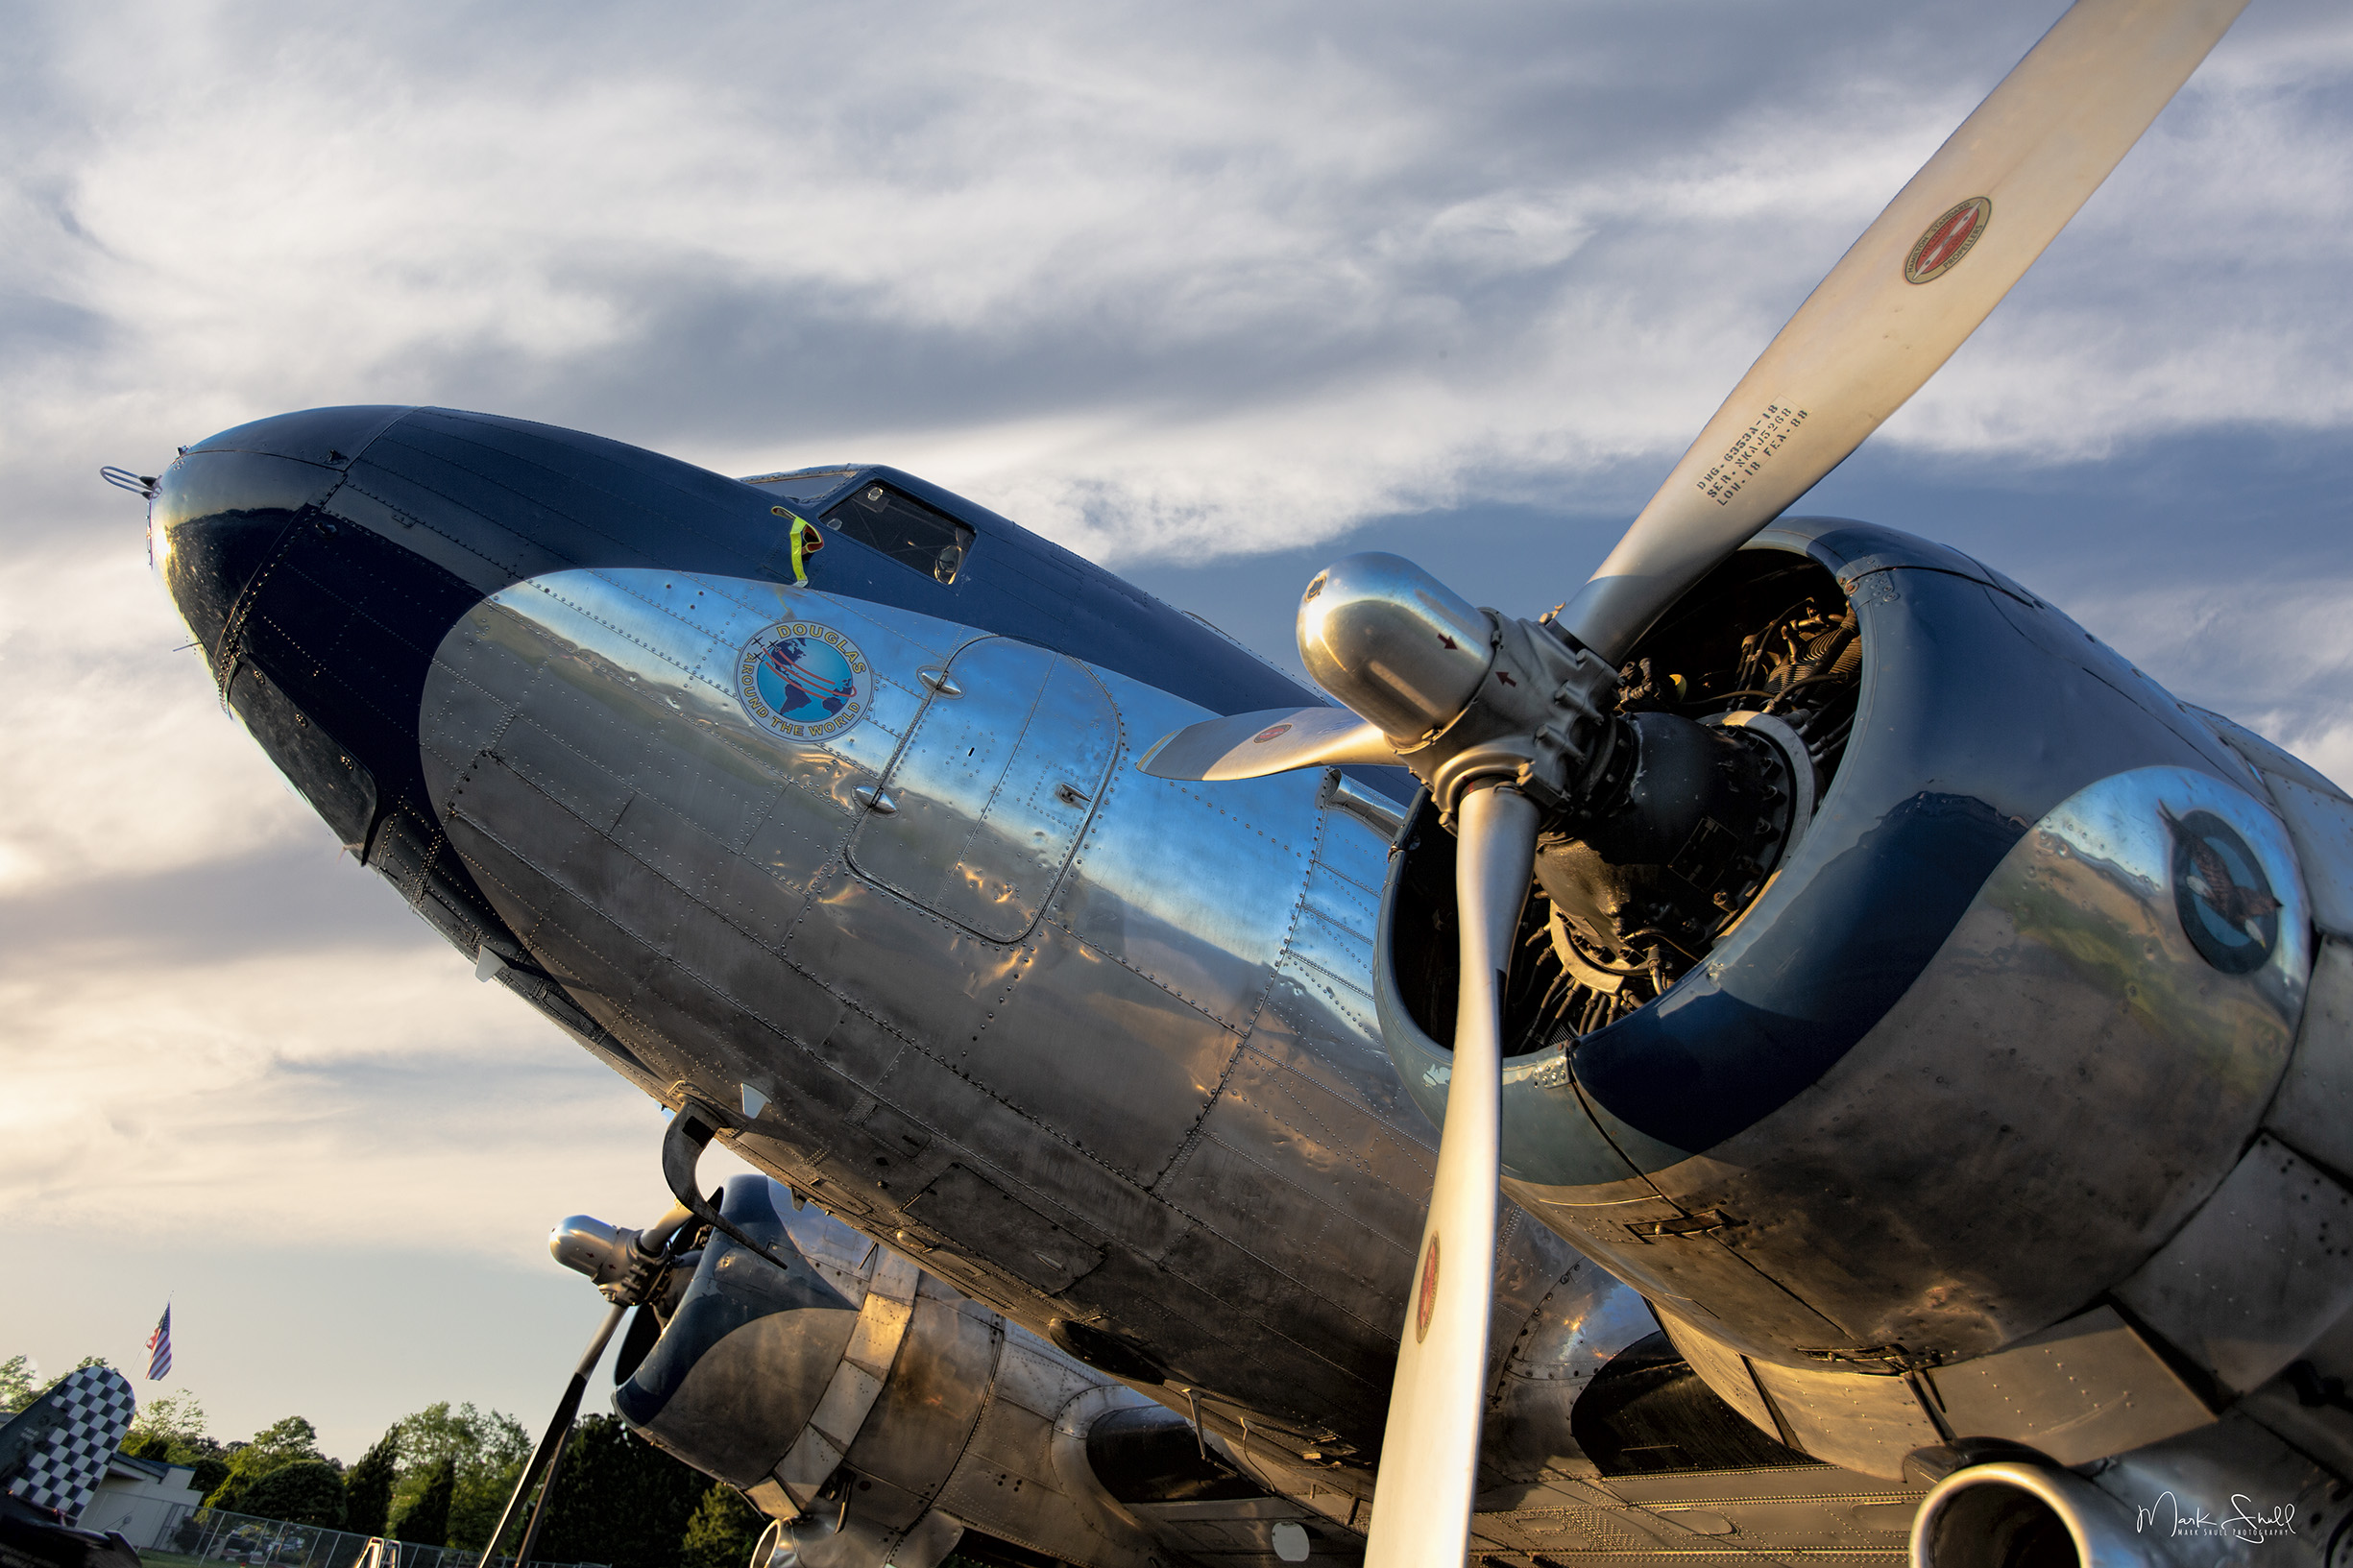 DC-3 sunset